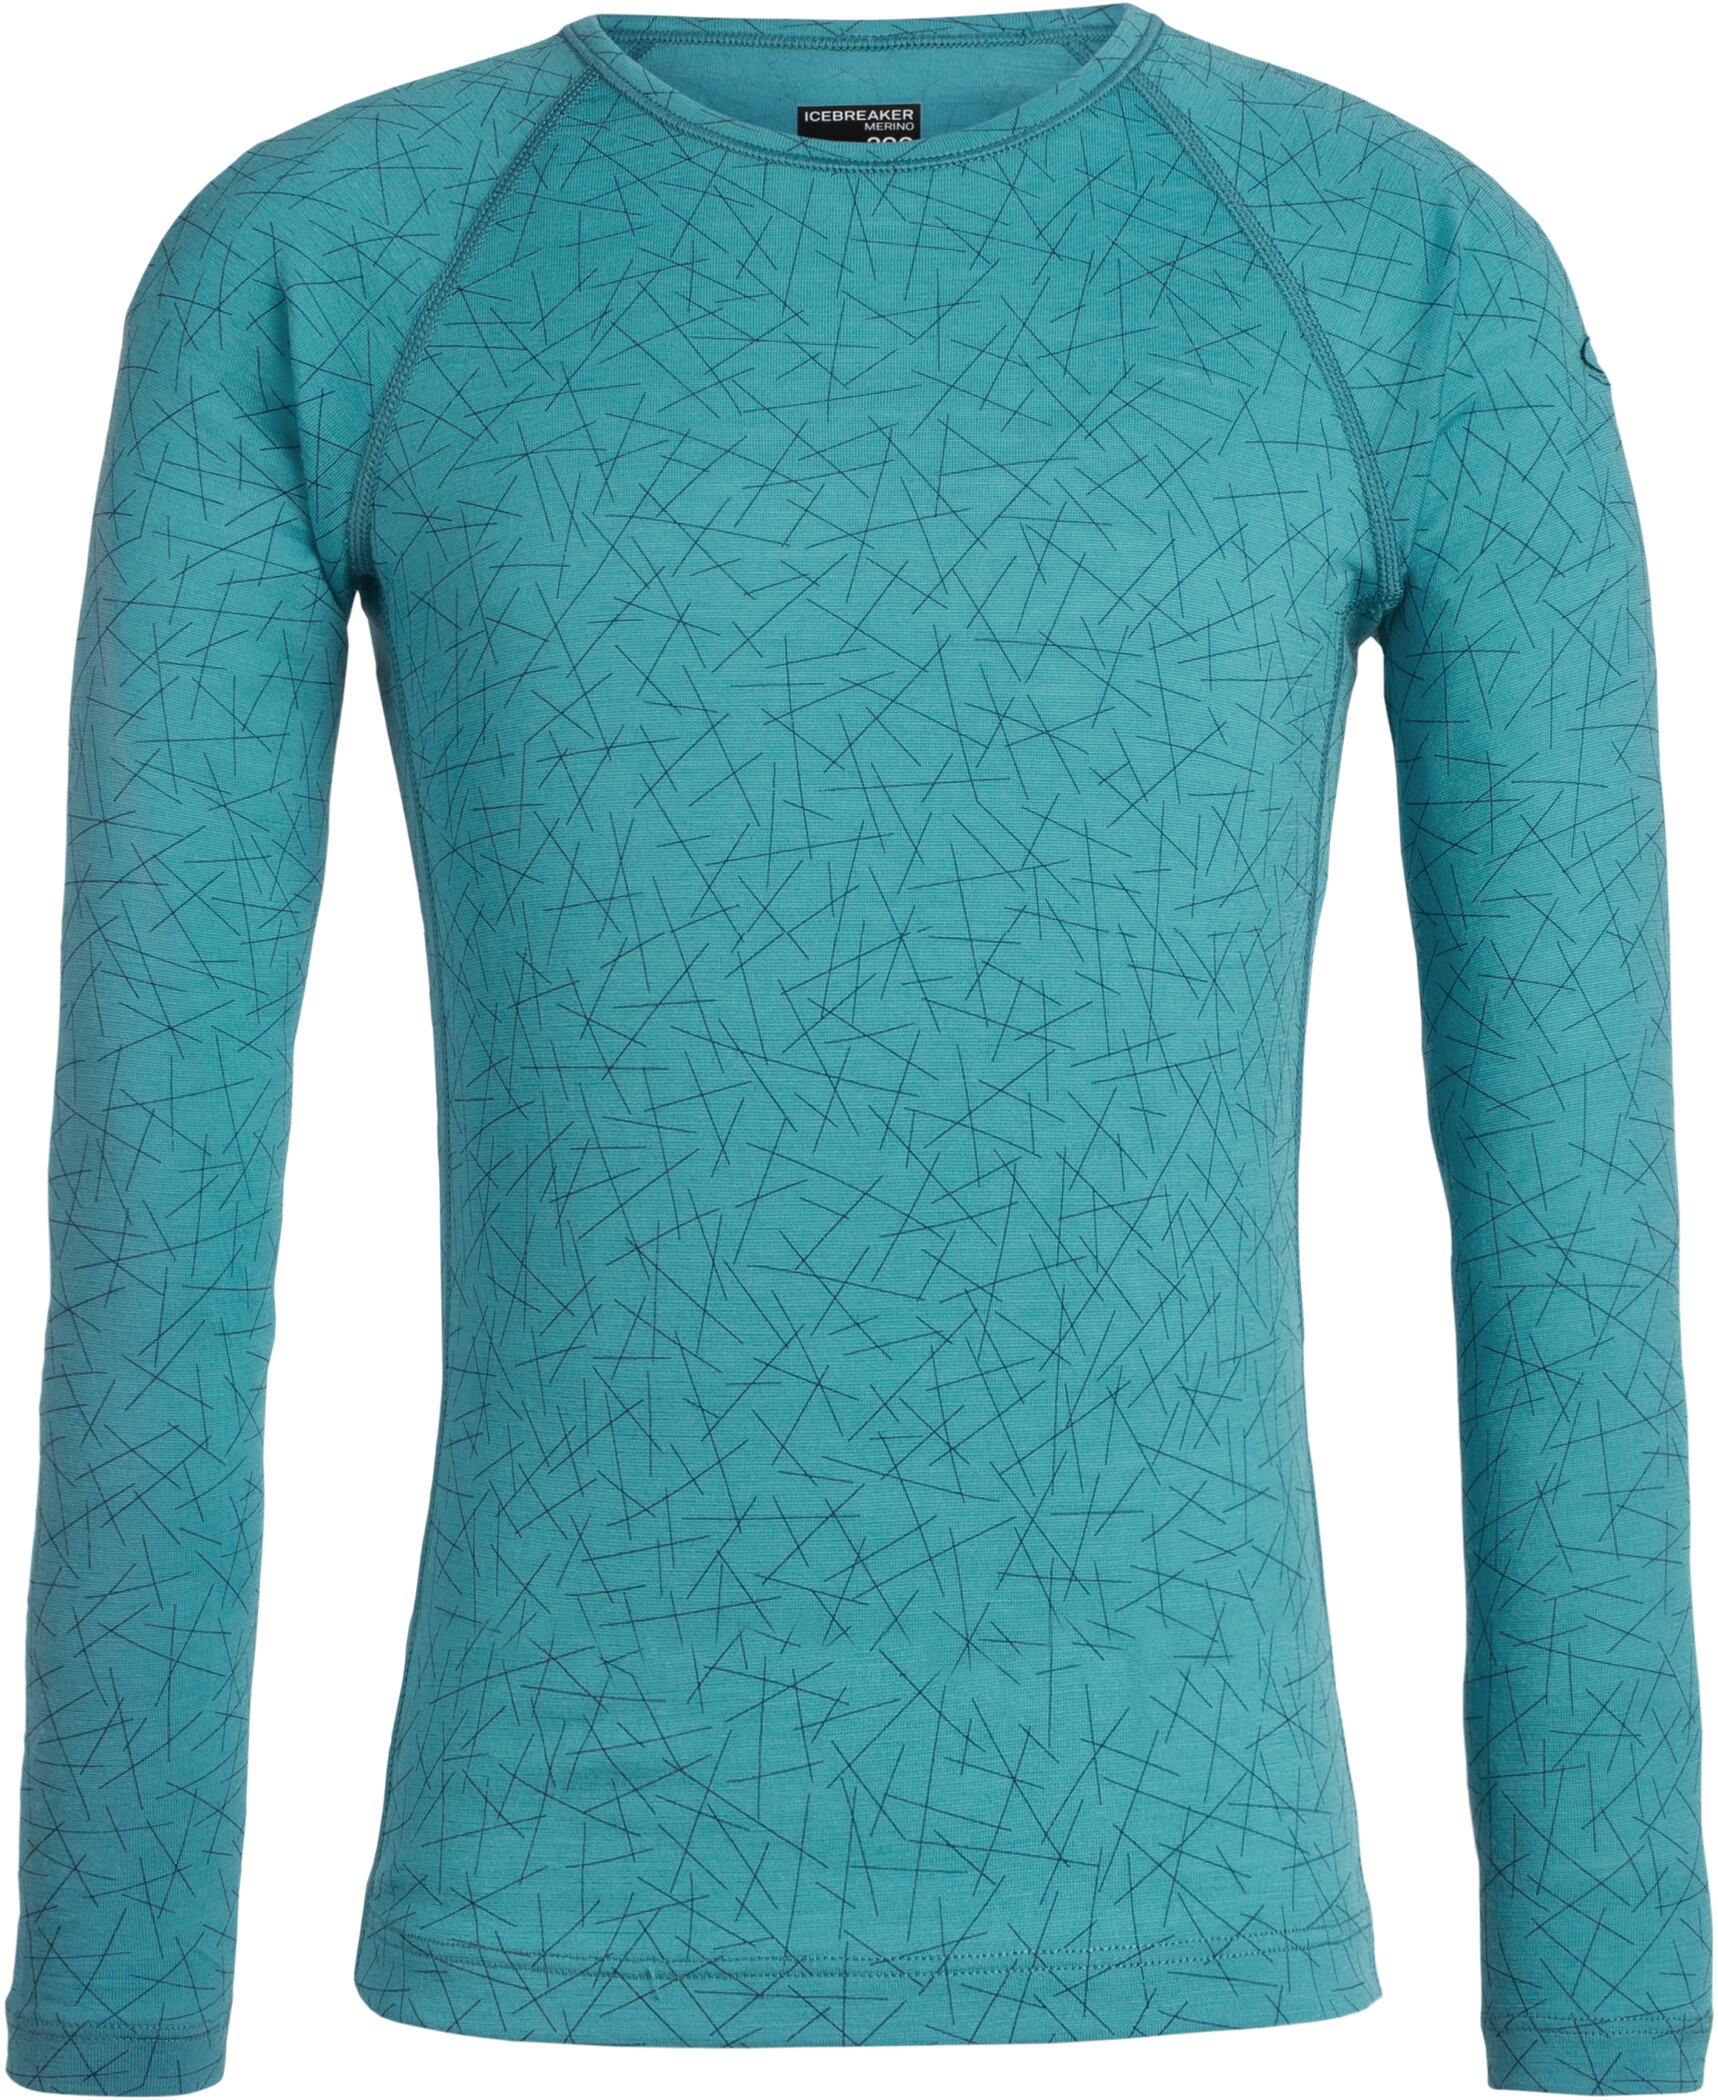 Icebreaker 200 Oasis Sky Paths Langærmet T-shirt Børn, arctic teal (2019) | Base layers